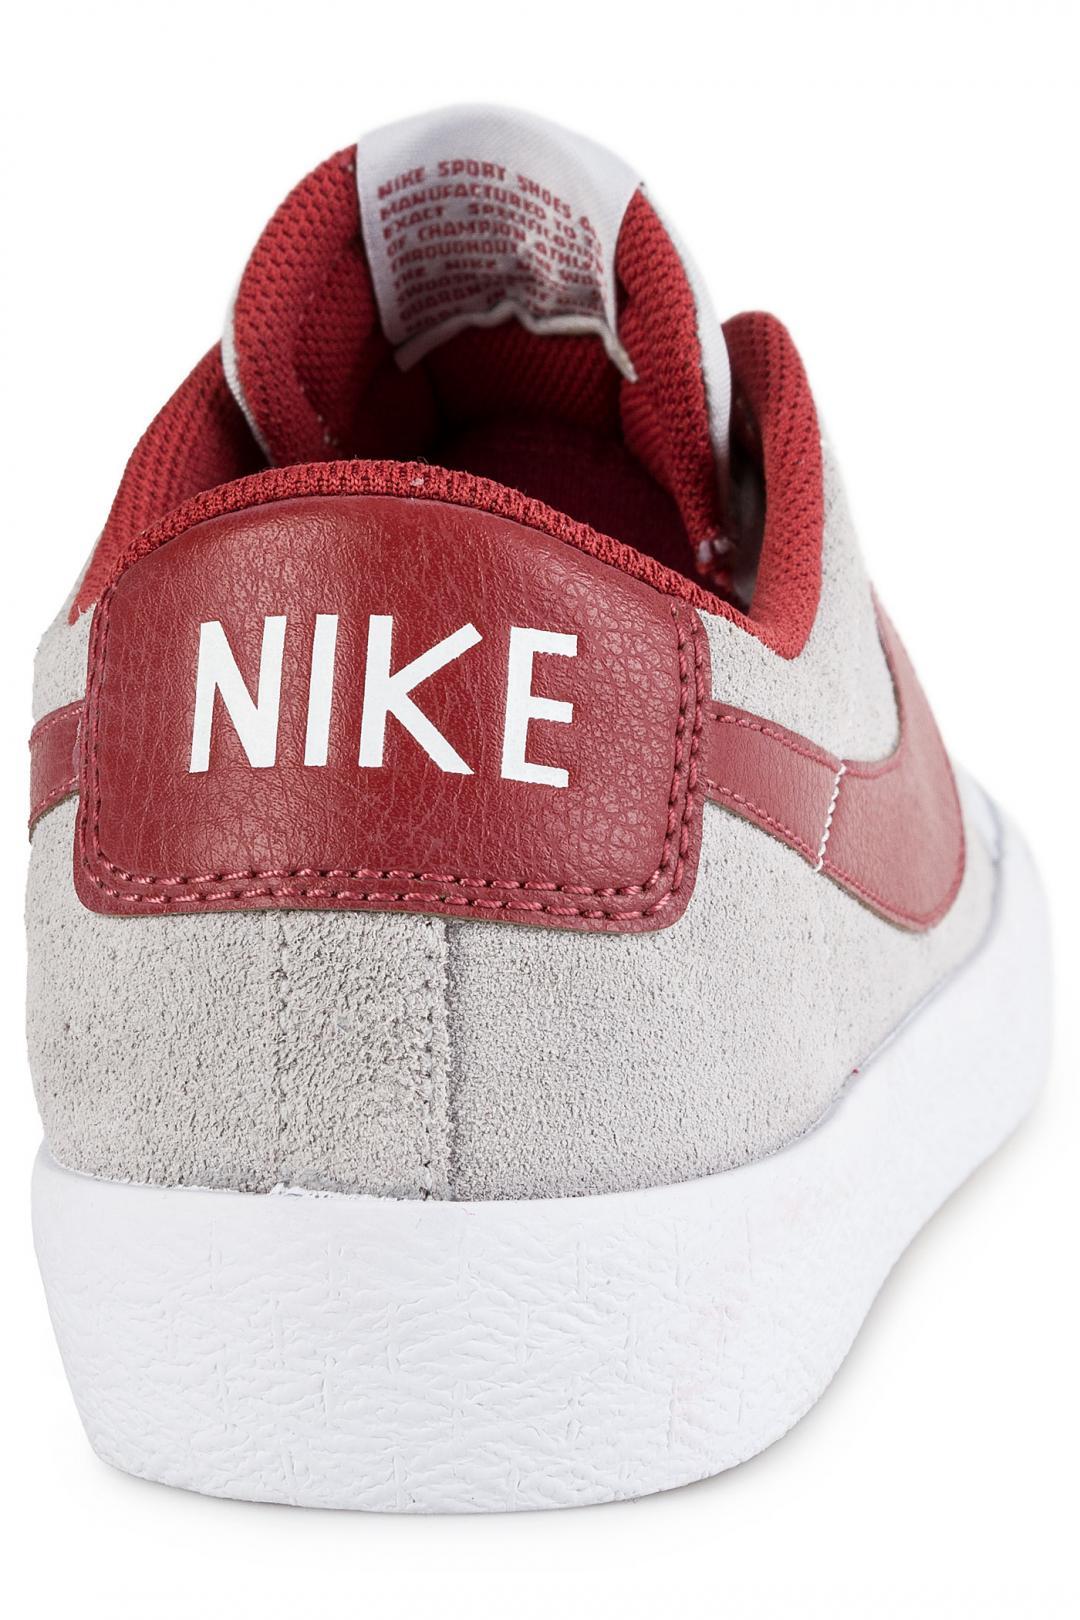 Uomo Nike SB Zoom Blazer Low XT pure platinum cedar | Scarpe da skate